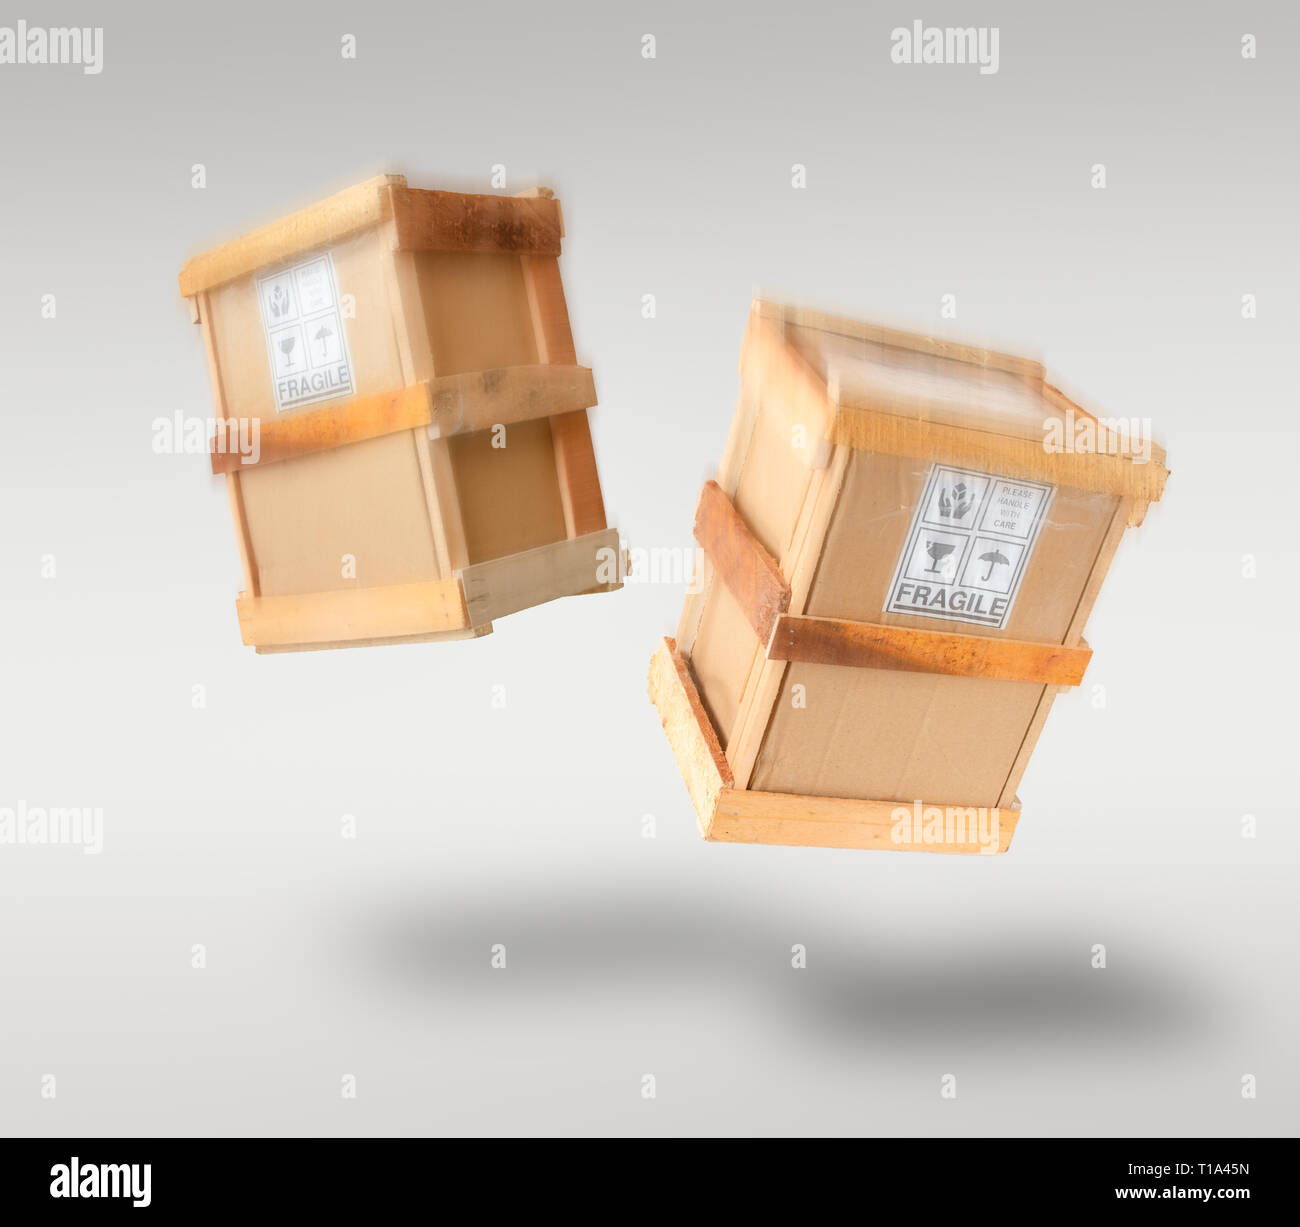 Fragile boxes free falling through the air - logistics & e